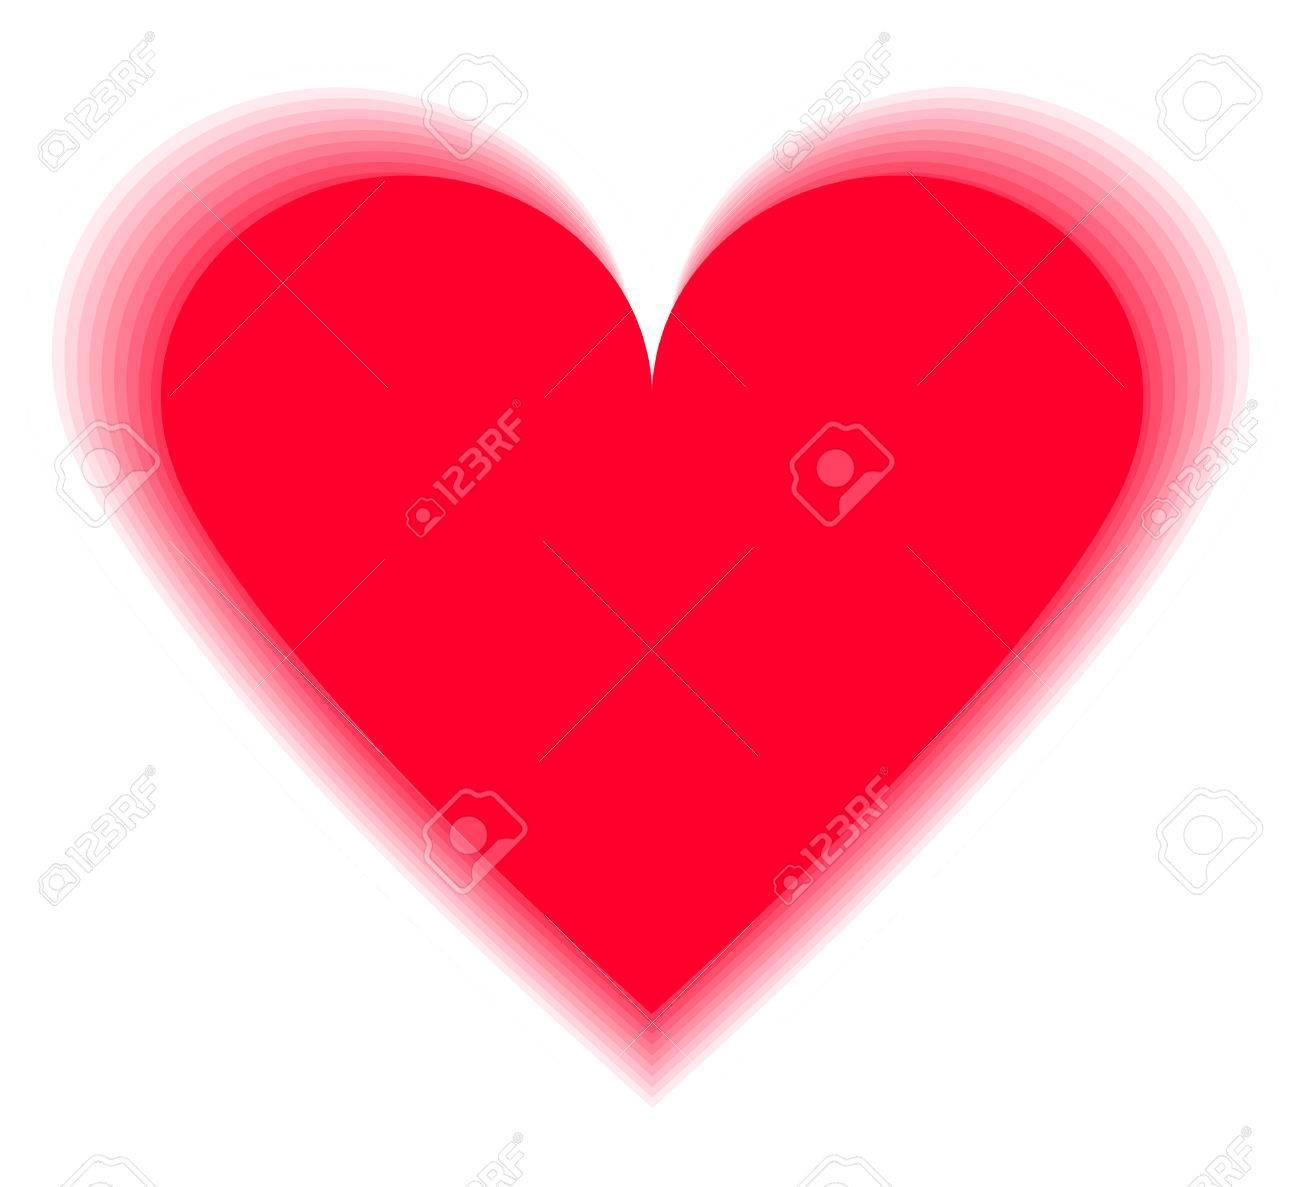 Love symbols com choice image symbol and sign ideas heart shape design for love symbols textured valentines day heart shape design for love symbols textured biocorpaavc